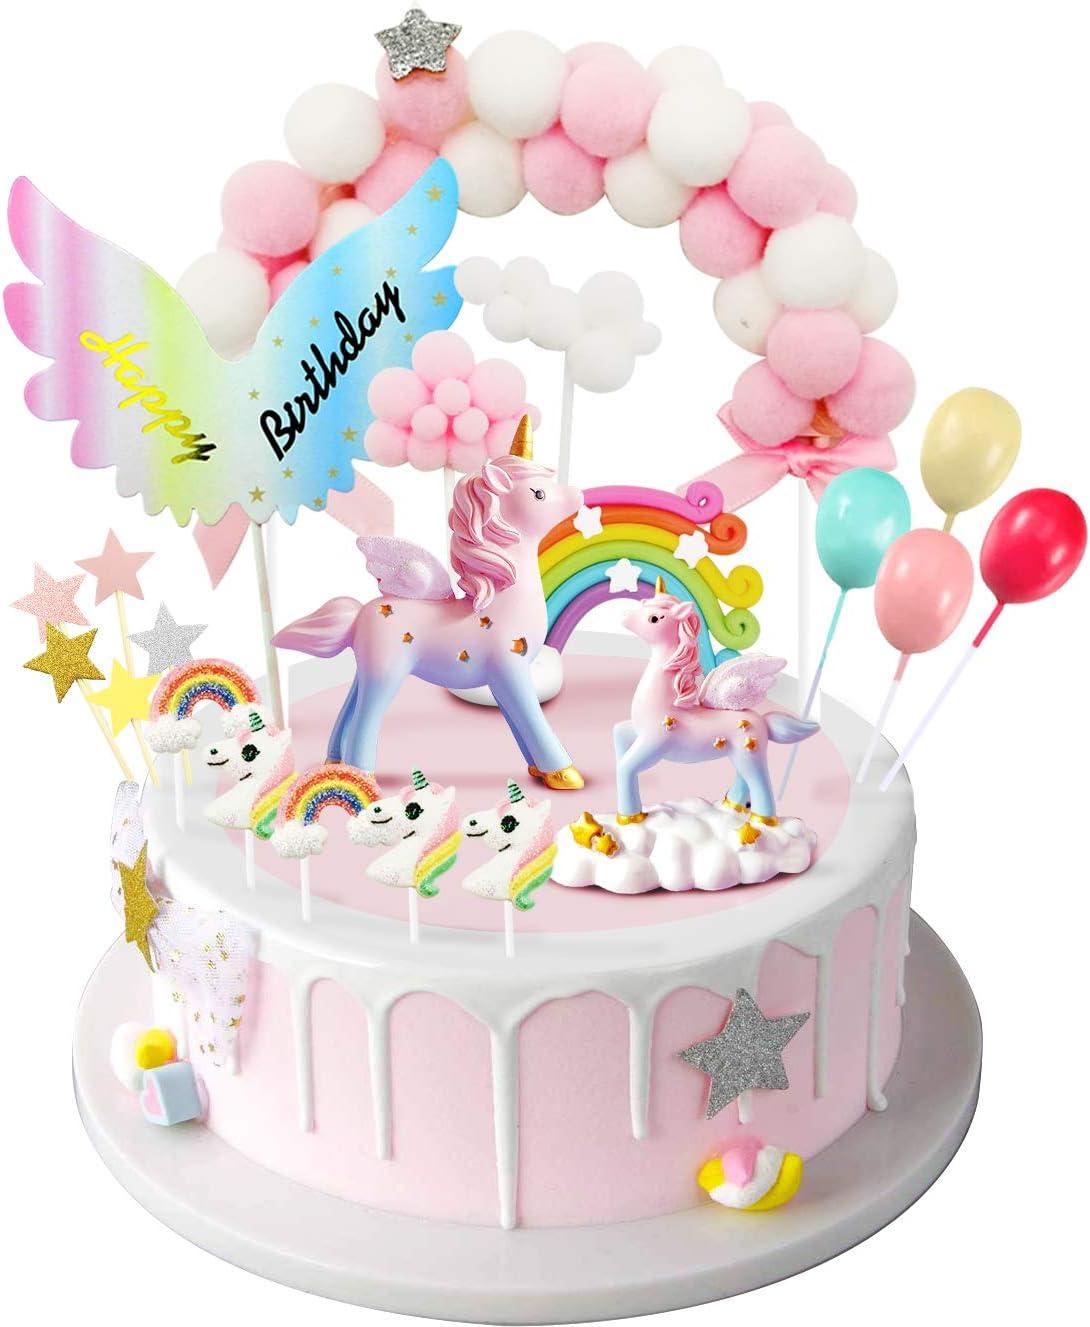 Marvelous Izoel Unicorn Cake Topper 1 Pink Hairball Arch 1 Rainbow 1Wings Birthday Cards Printable Benkemecafe Filternl